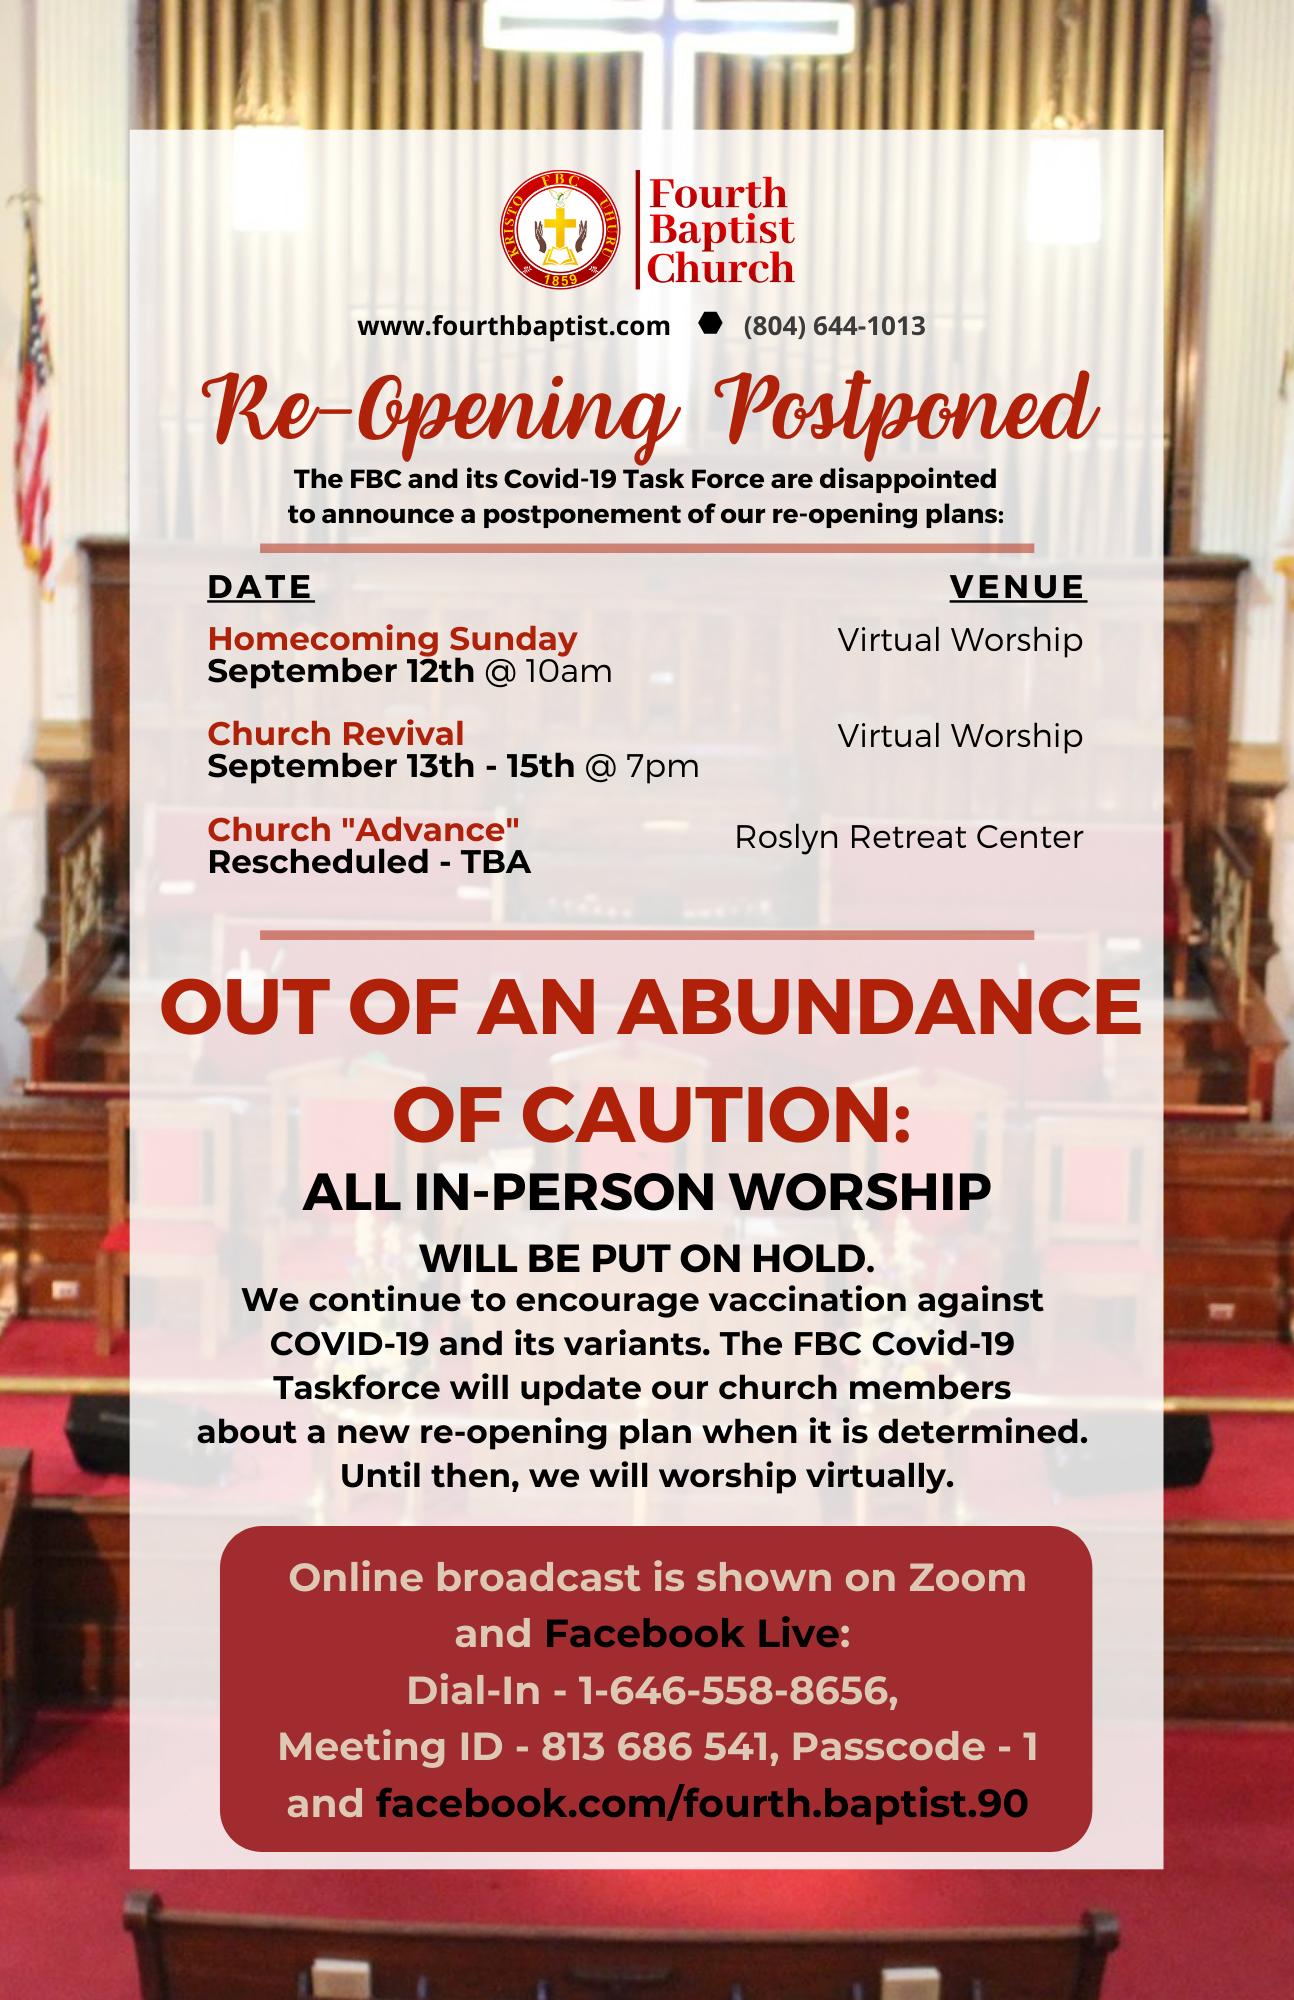 Re-Opening Postponed